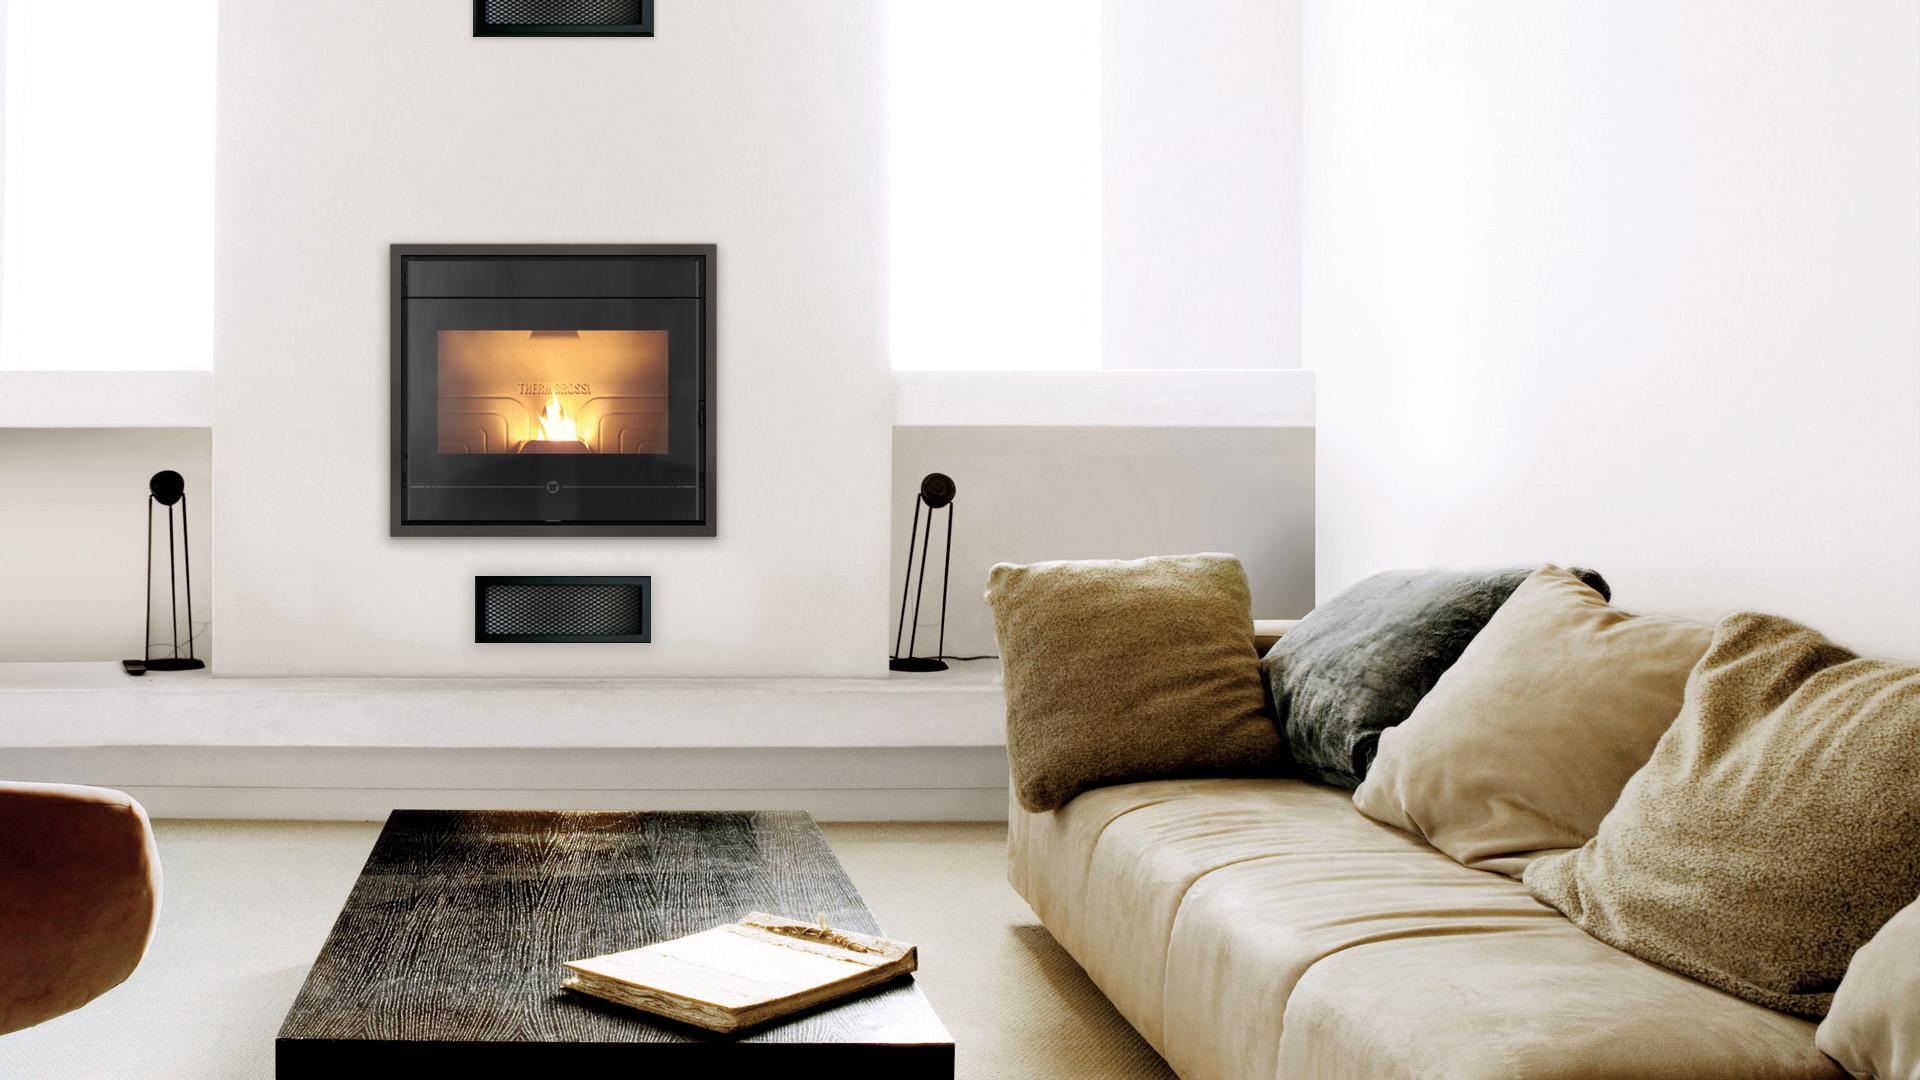 po les granul s insert line 600 s fires chauffage bois et granul s. Black Bedroom Furniture Sets. Home Design Ideas